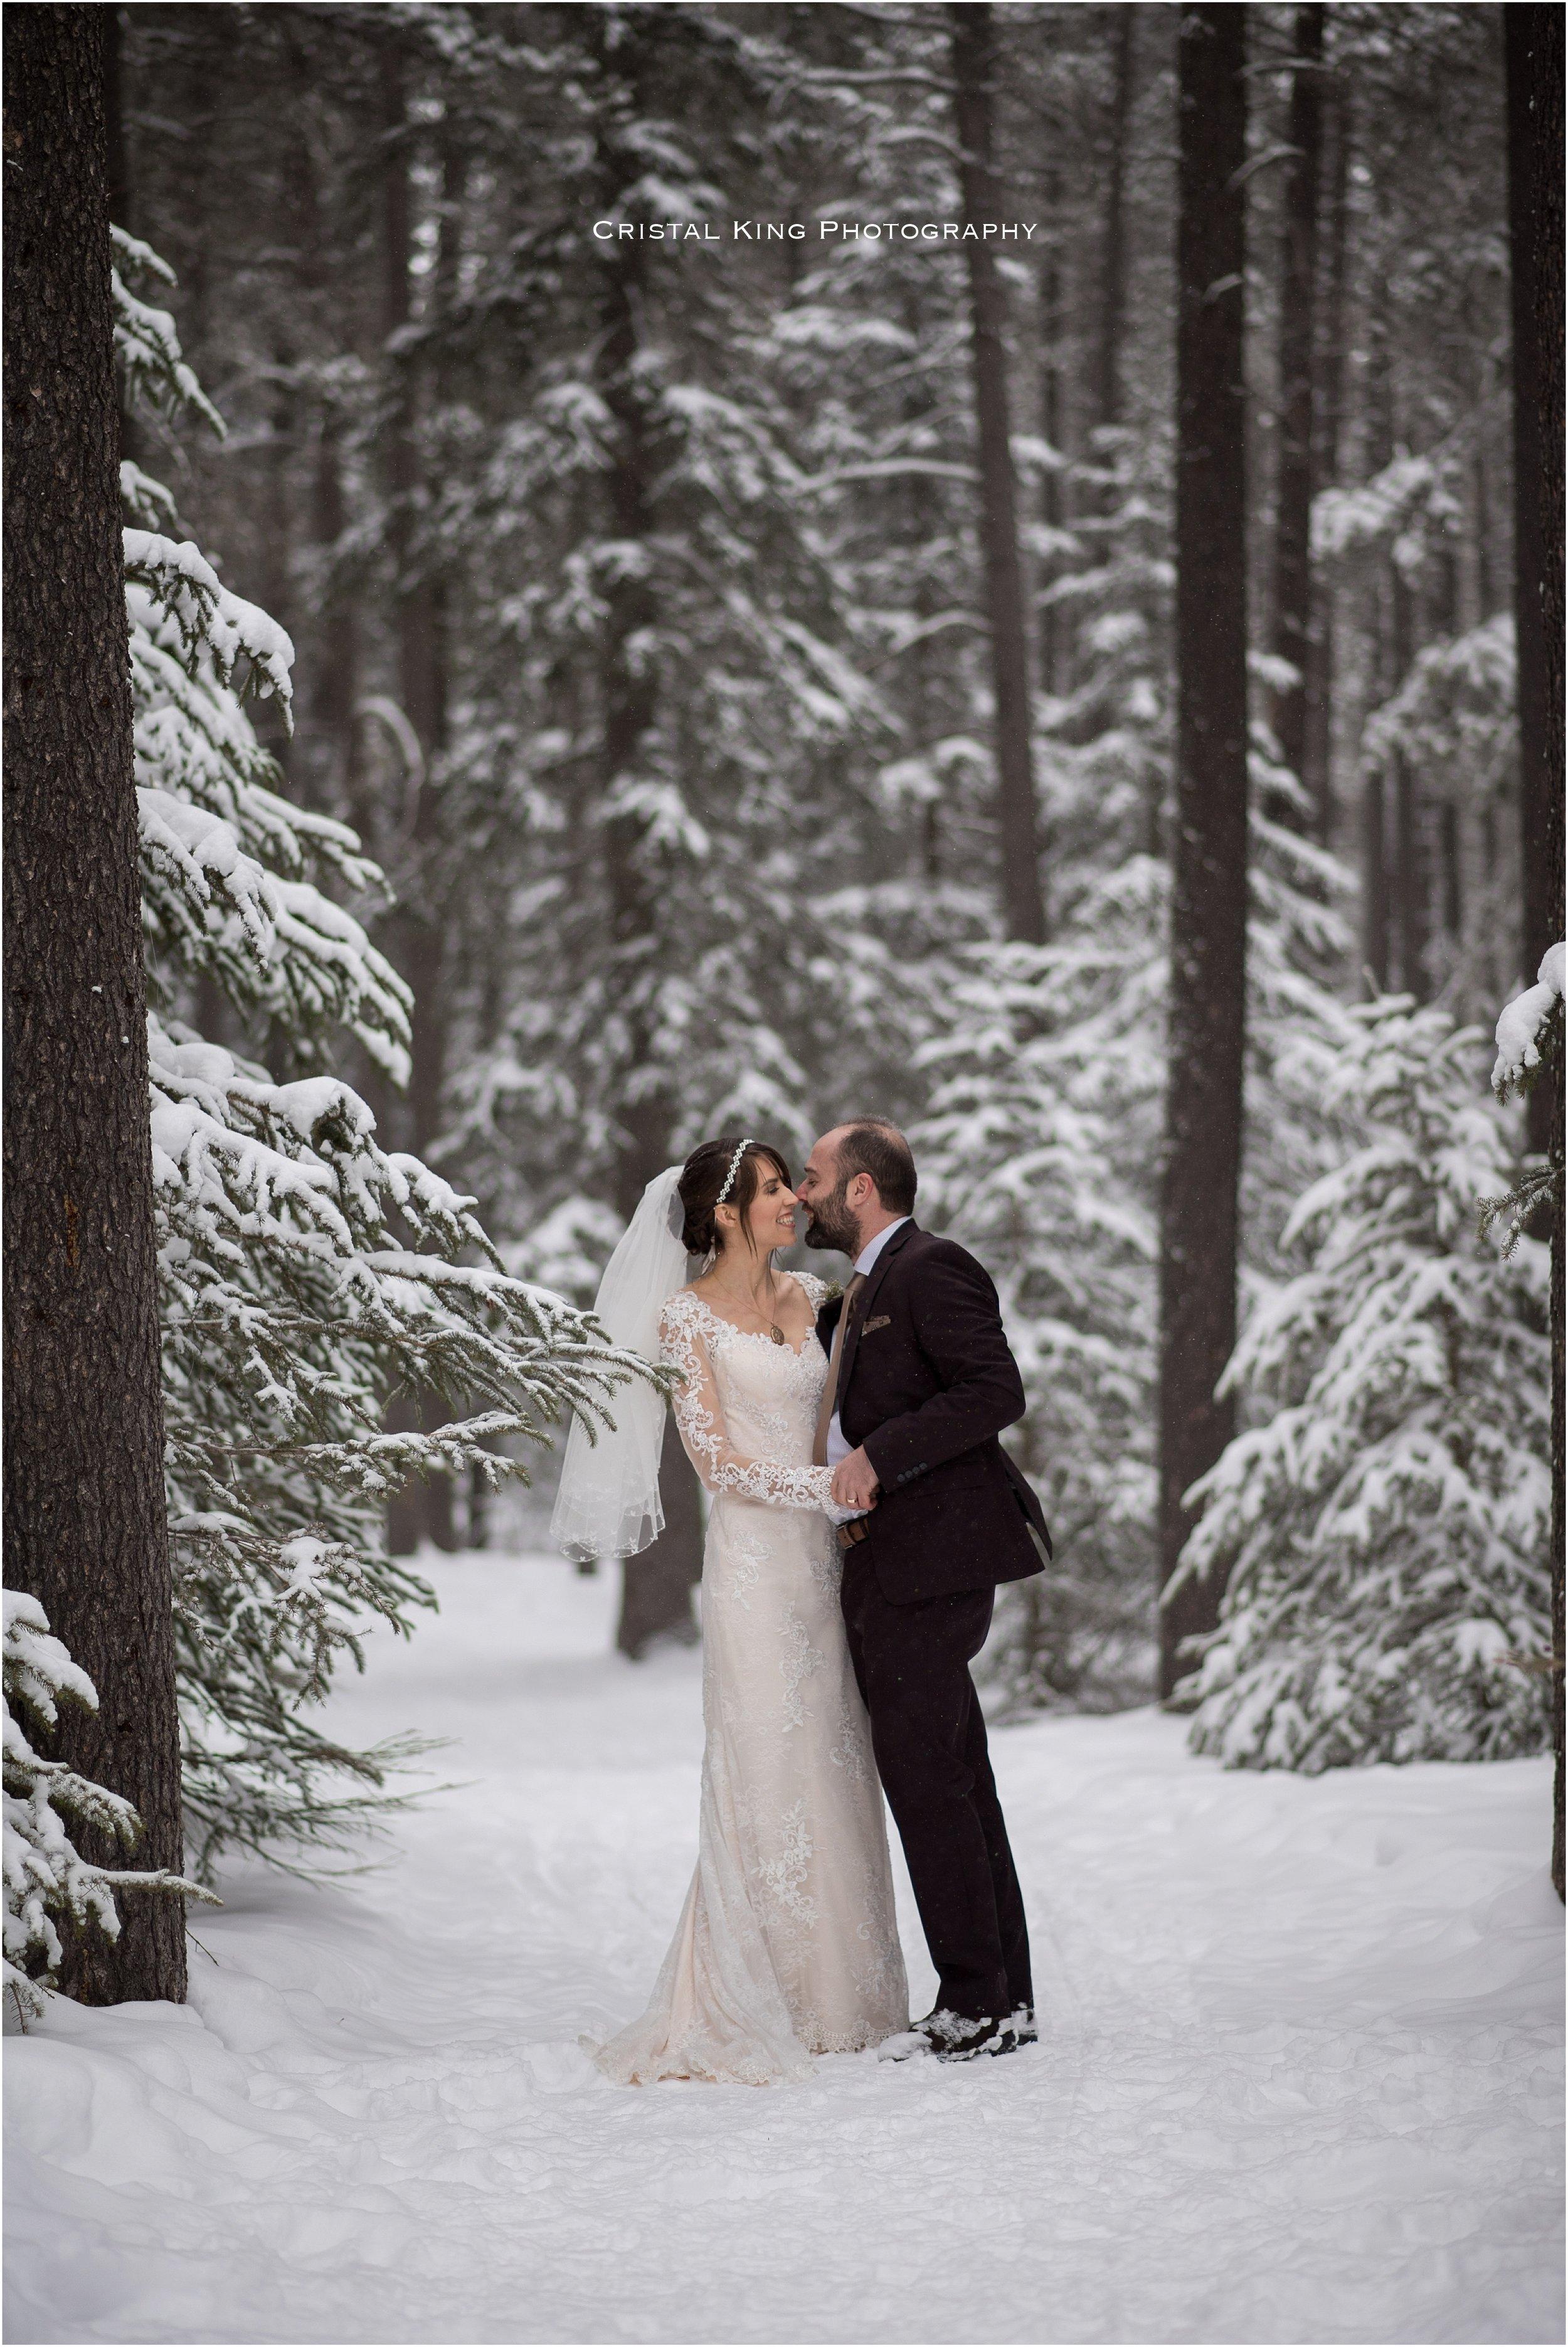 Jacqueline-Jasons-Wedding-93.jpg